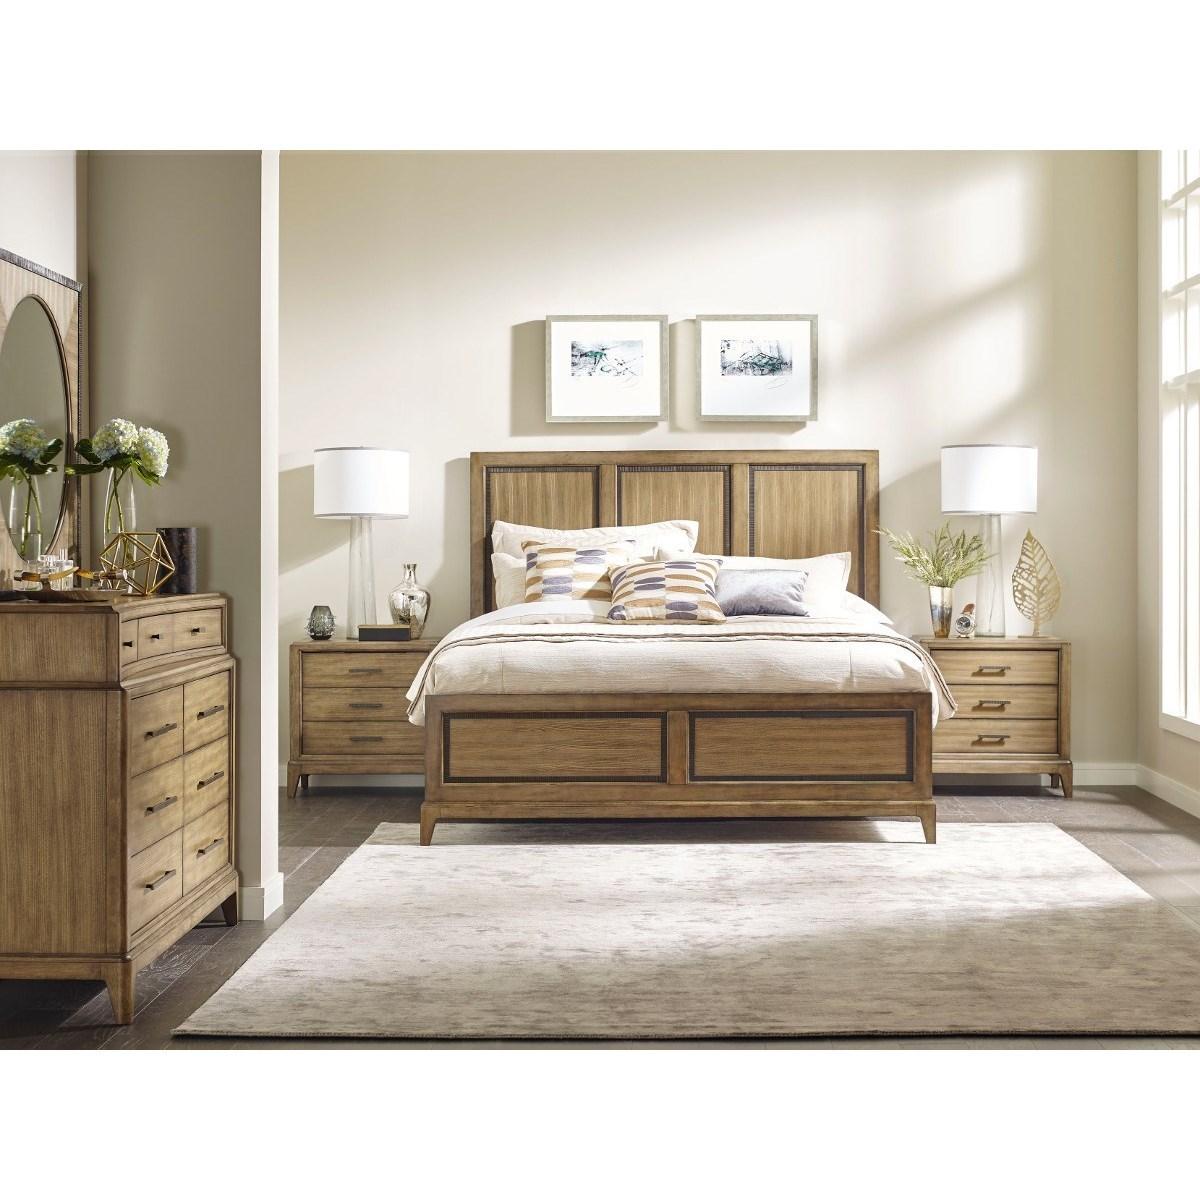 American Drew EVOKE  Californiak King Bedroom Group - Item Number: 509 CK Bedroom Group 1